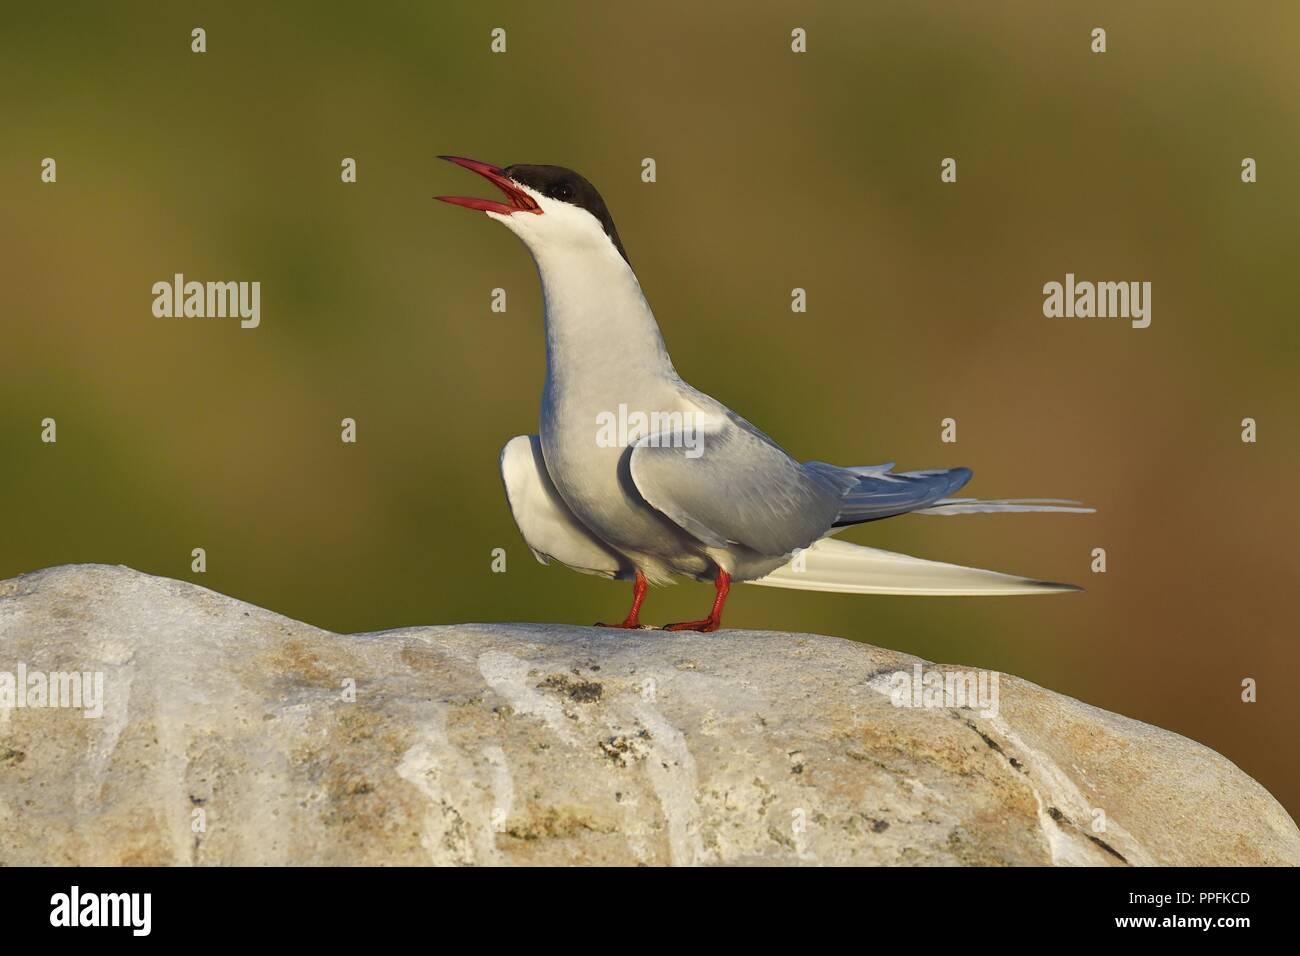 Arctic tern (Sterna paradisaea), adult bird calling on stone, Varanger, Norway - Stock Image